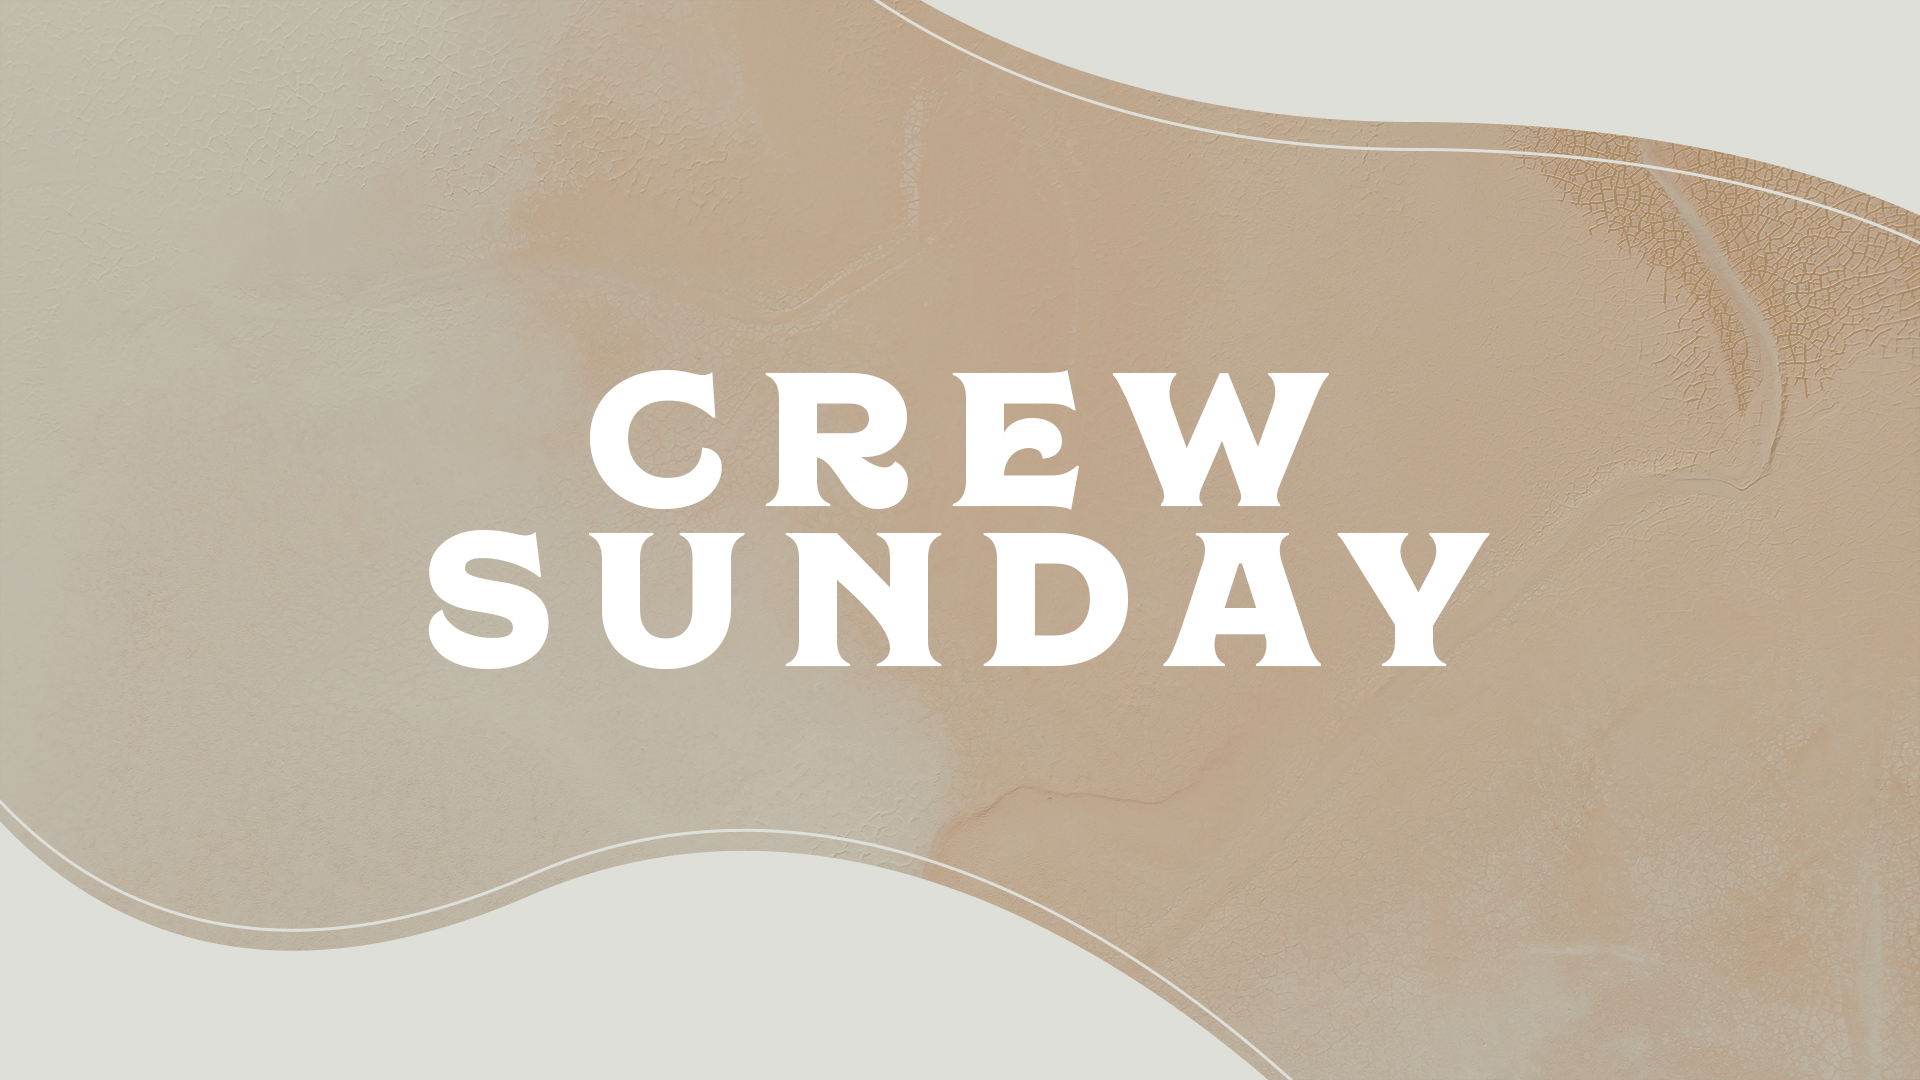 Crew Sunday - Aug 11.jpg